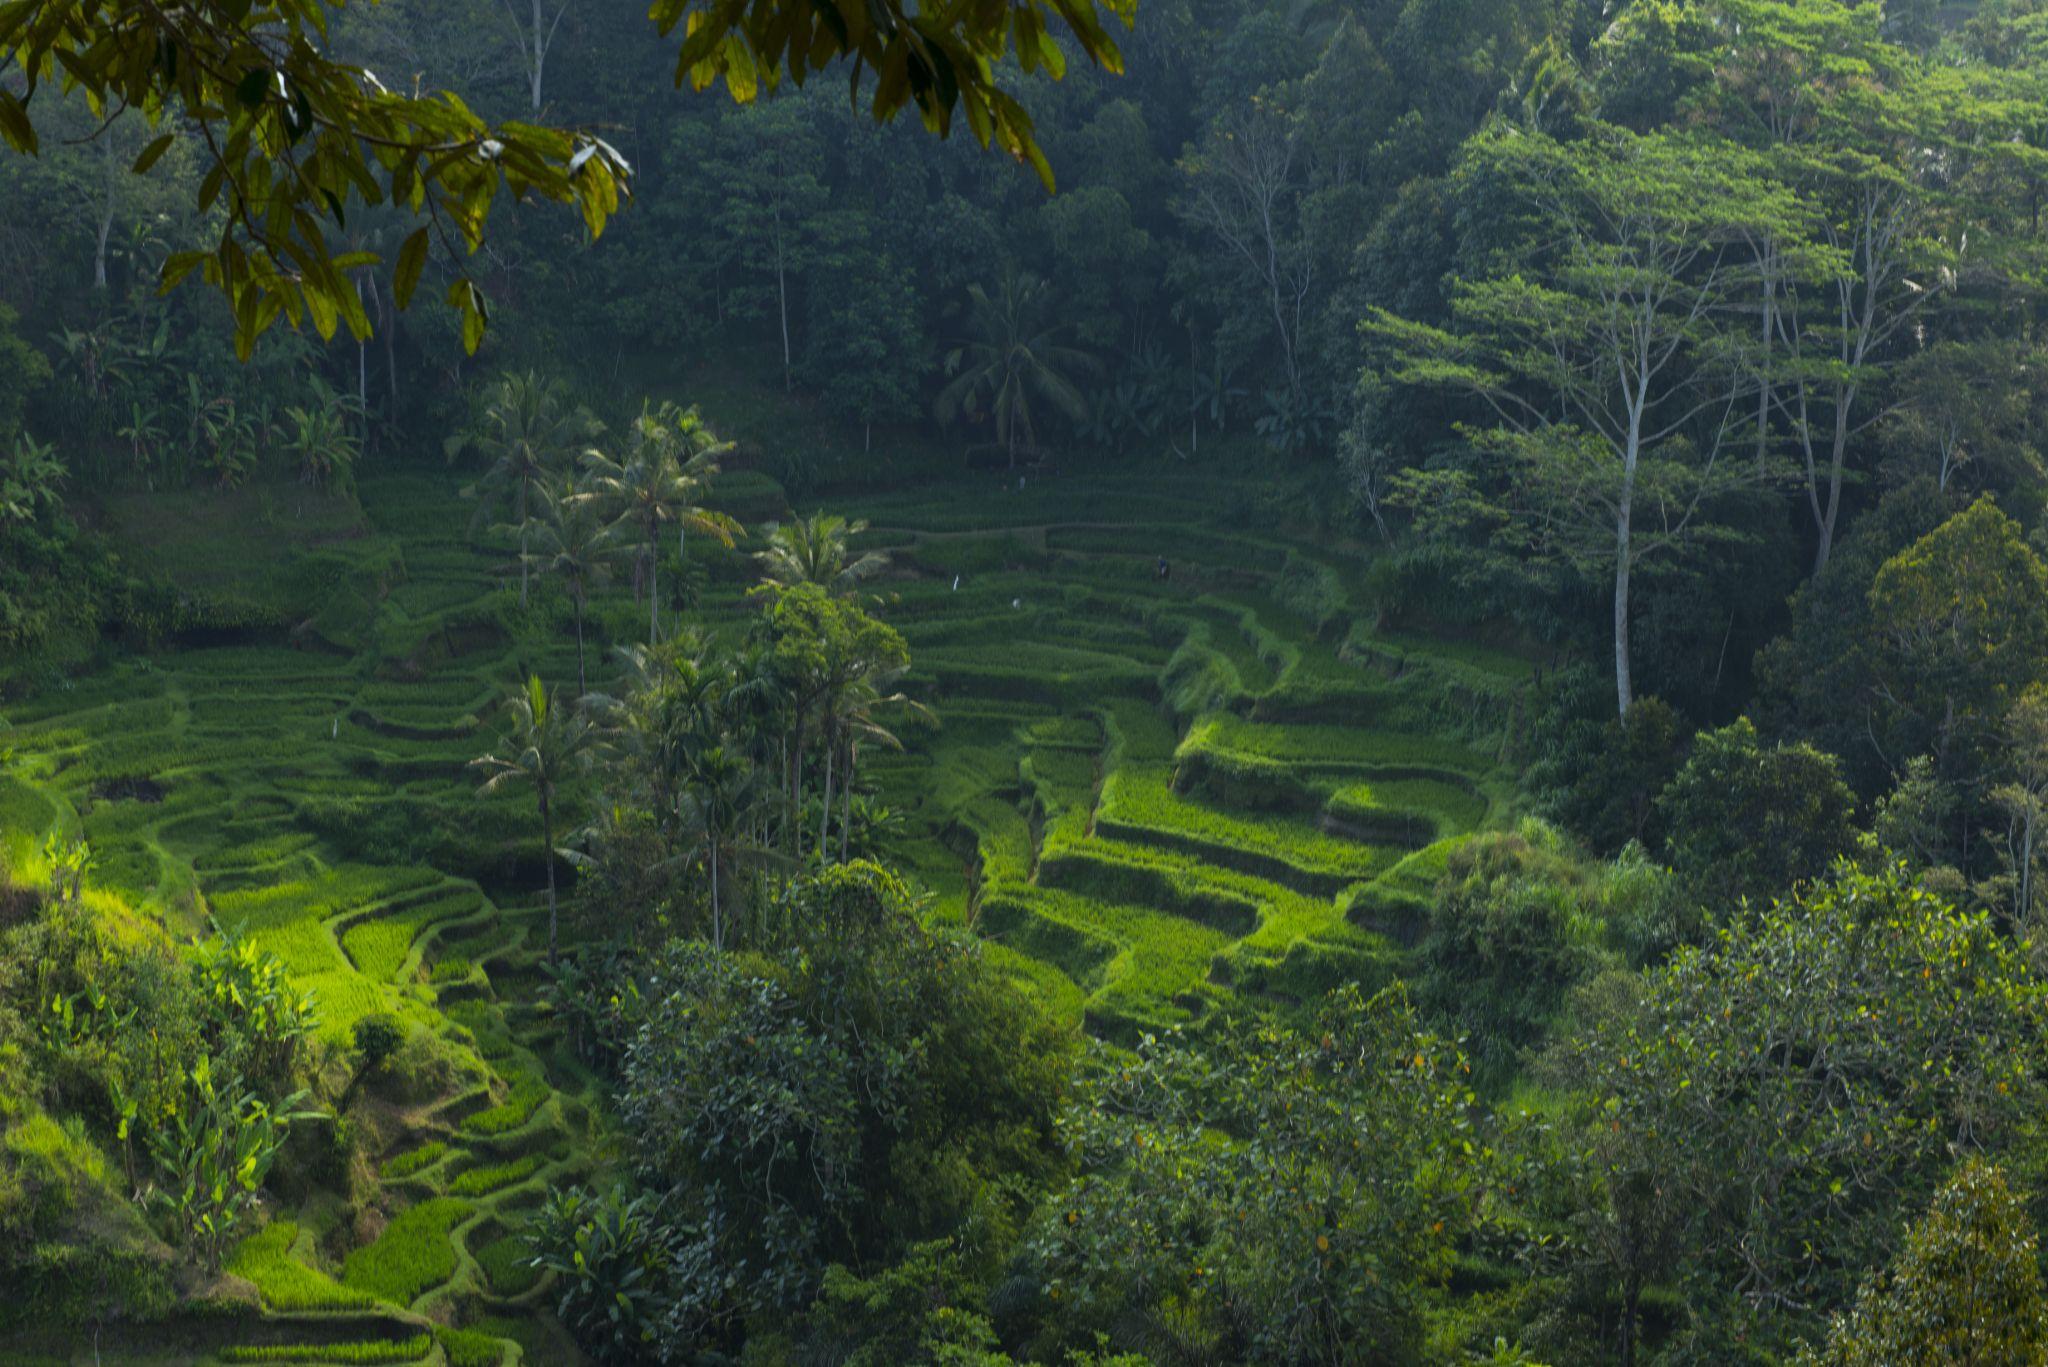 Paddy Field. Bali by eddylowck